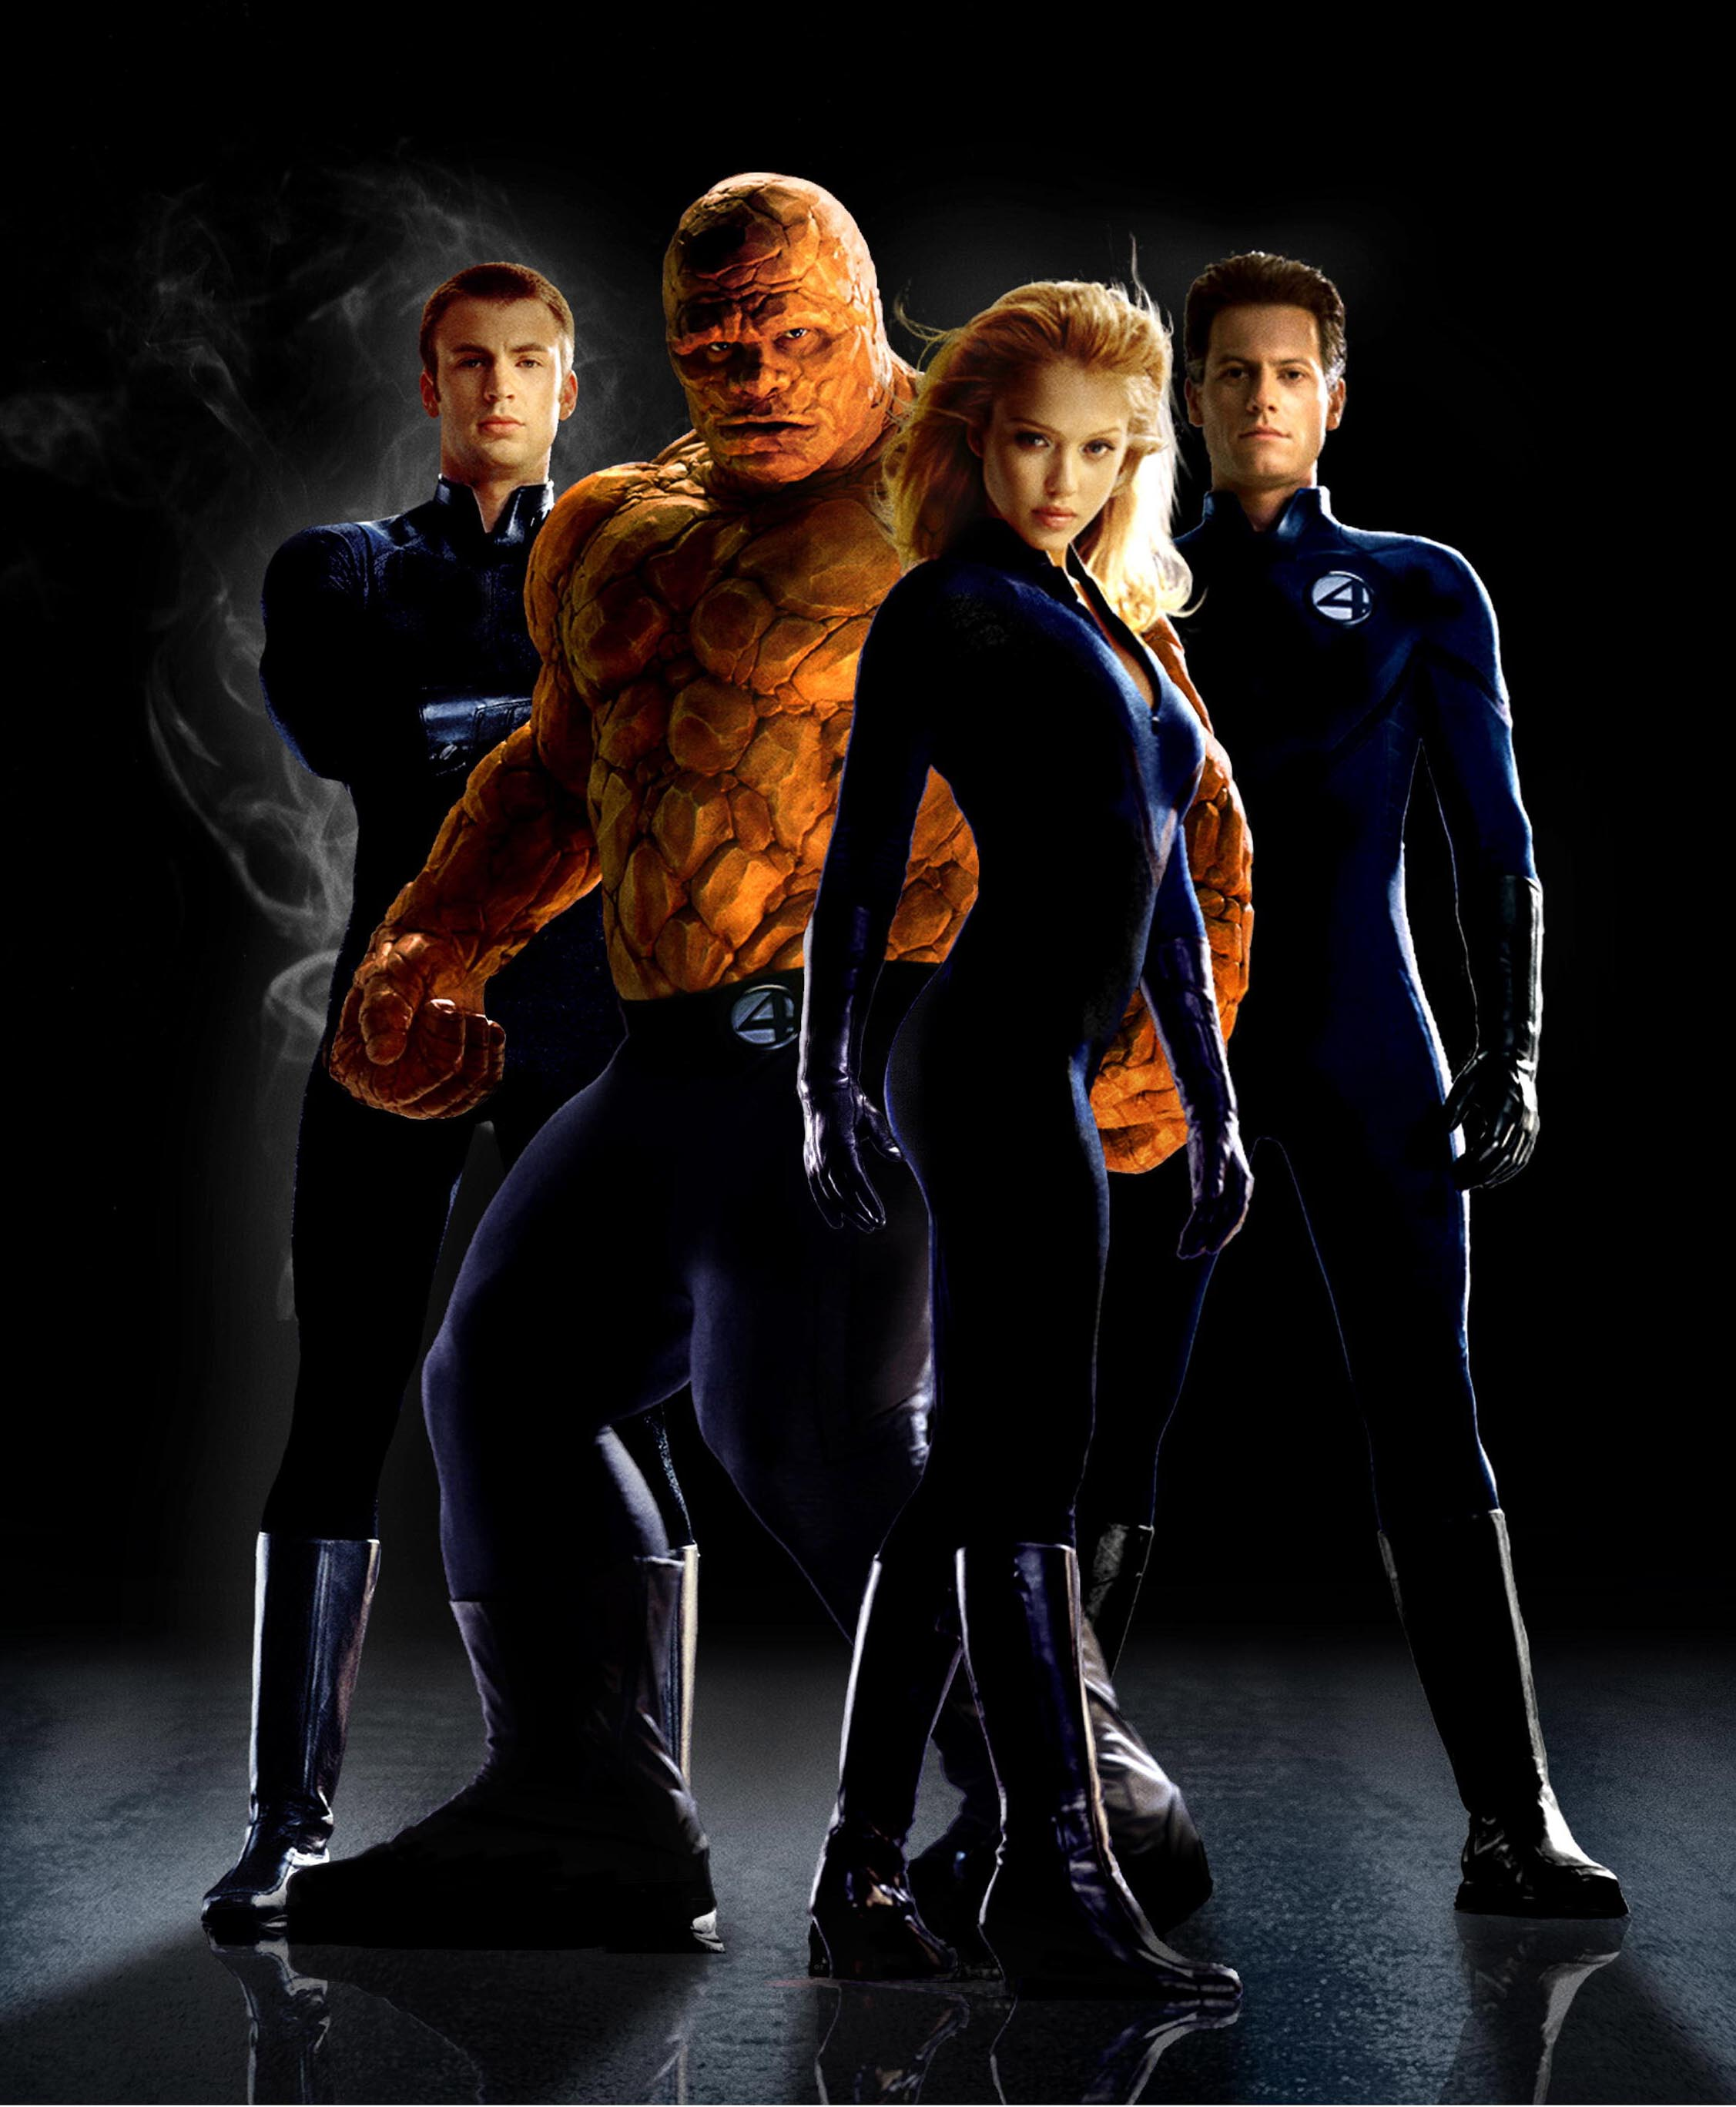 Chris Evans, Michael Chiklis, Jessica Alba, Ioan Gruffudd, Fantastic Four